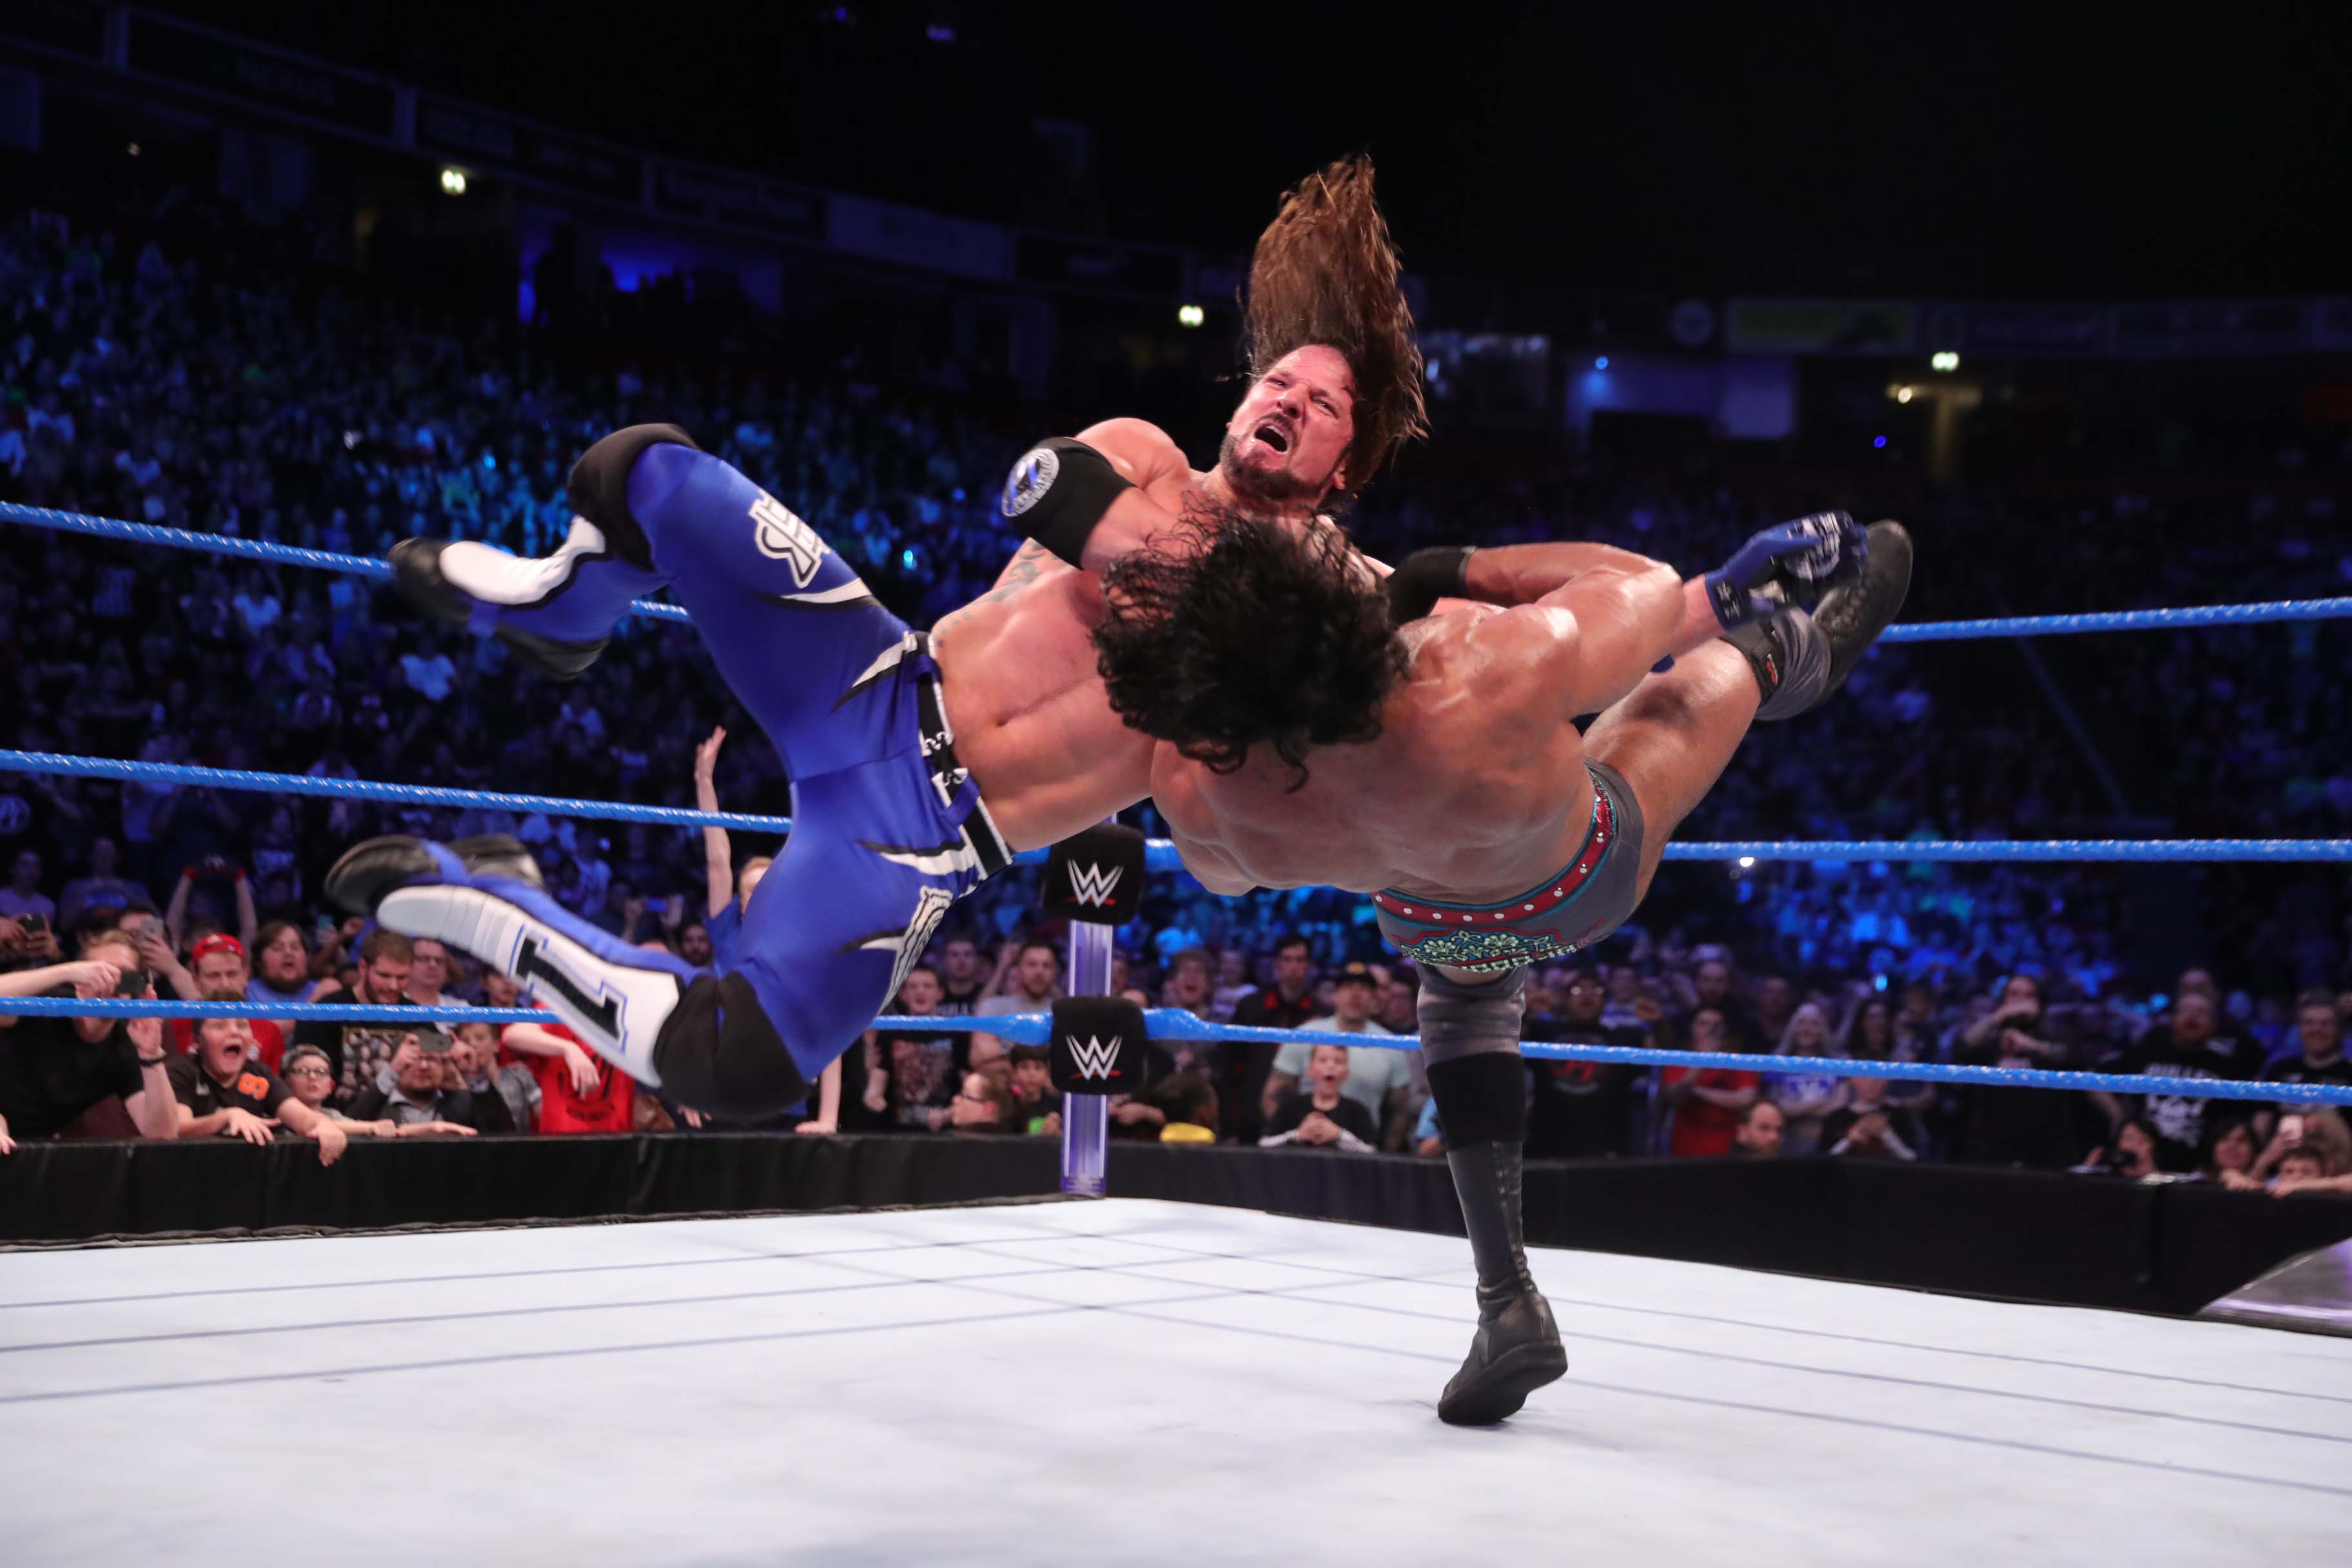 Eine Wrestling-Szene aus dem Ring